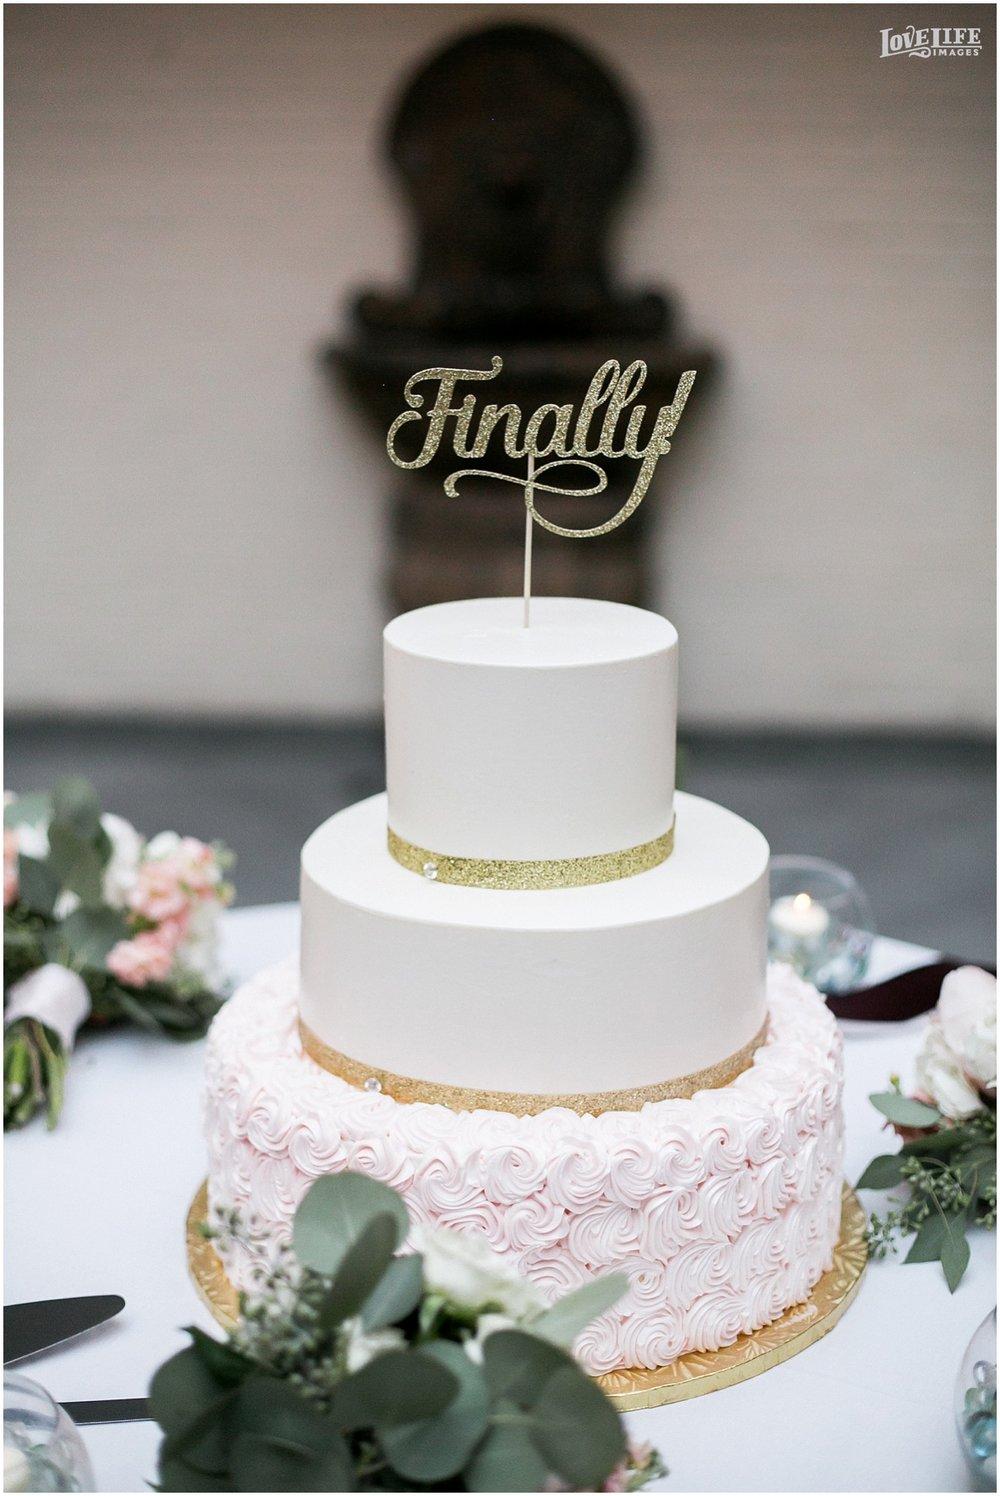 Engineer's Club Wedding cake with gold glitter.jpg